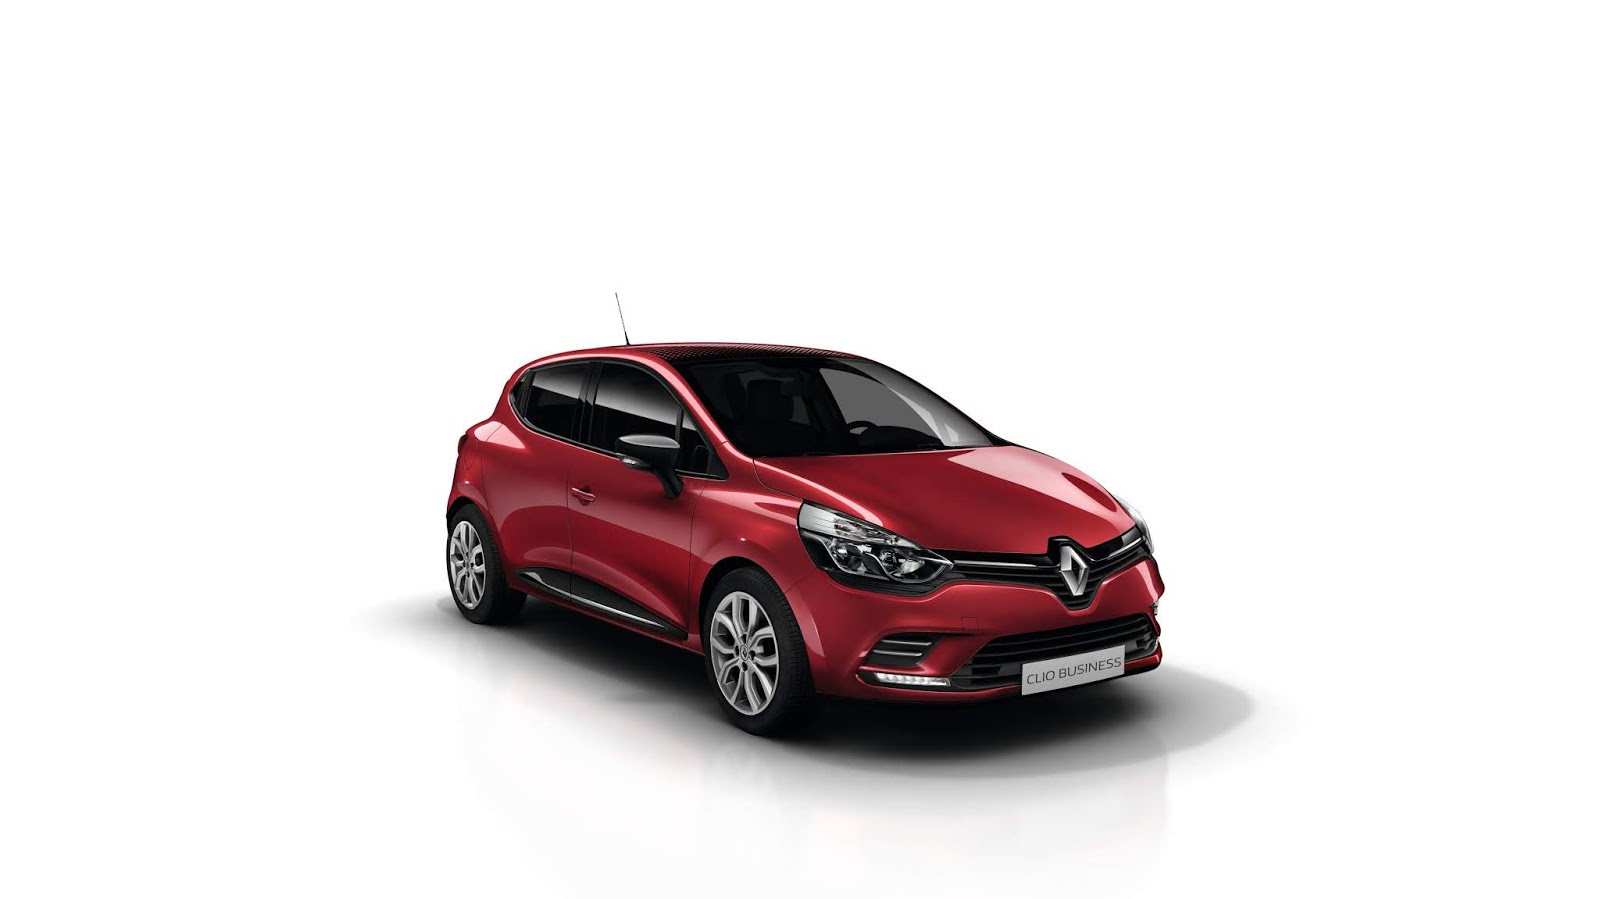 clio2Bvan2Bbusiness Ρεκόρ πωλήσεων για τα επαγγελματικά της Renault στην Ελλάδα Renault, Renault Clio Business, Renault Kangoo, VAN, Επαγγελματικά